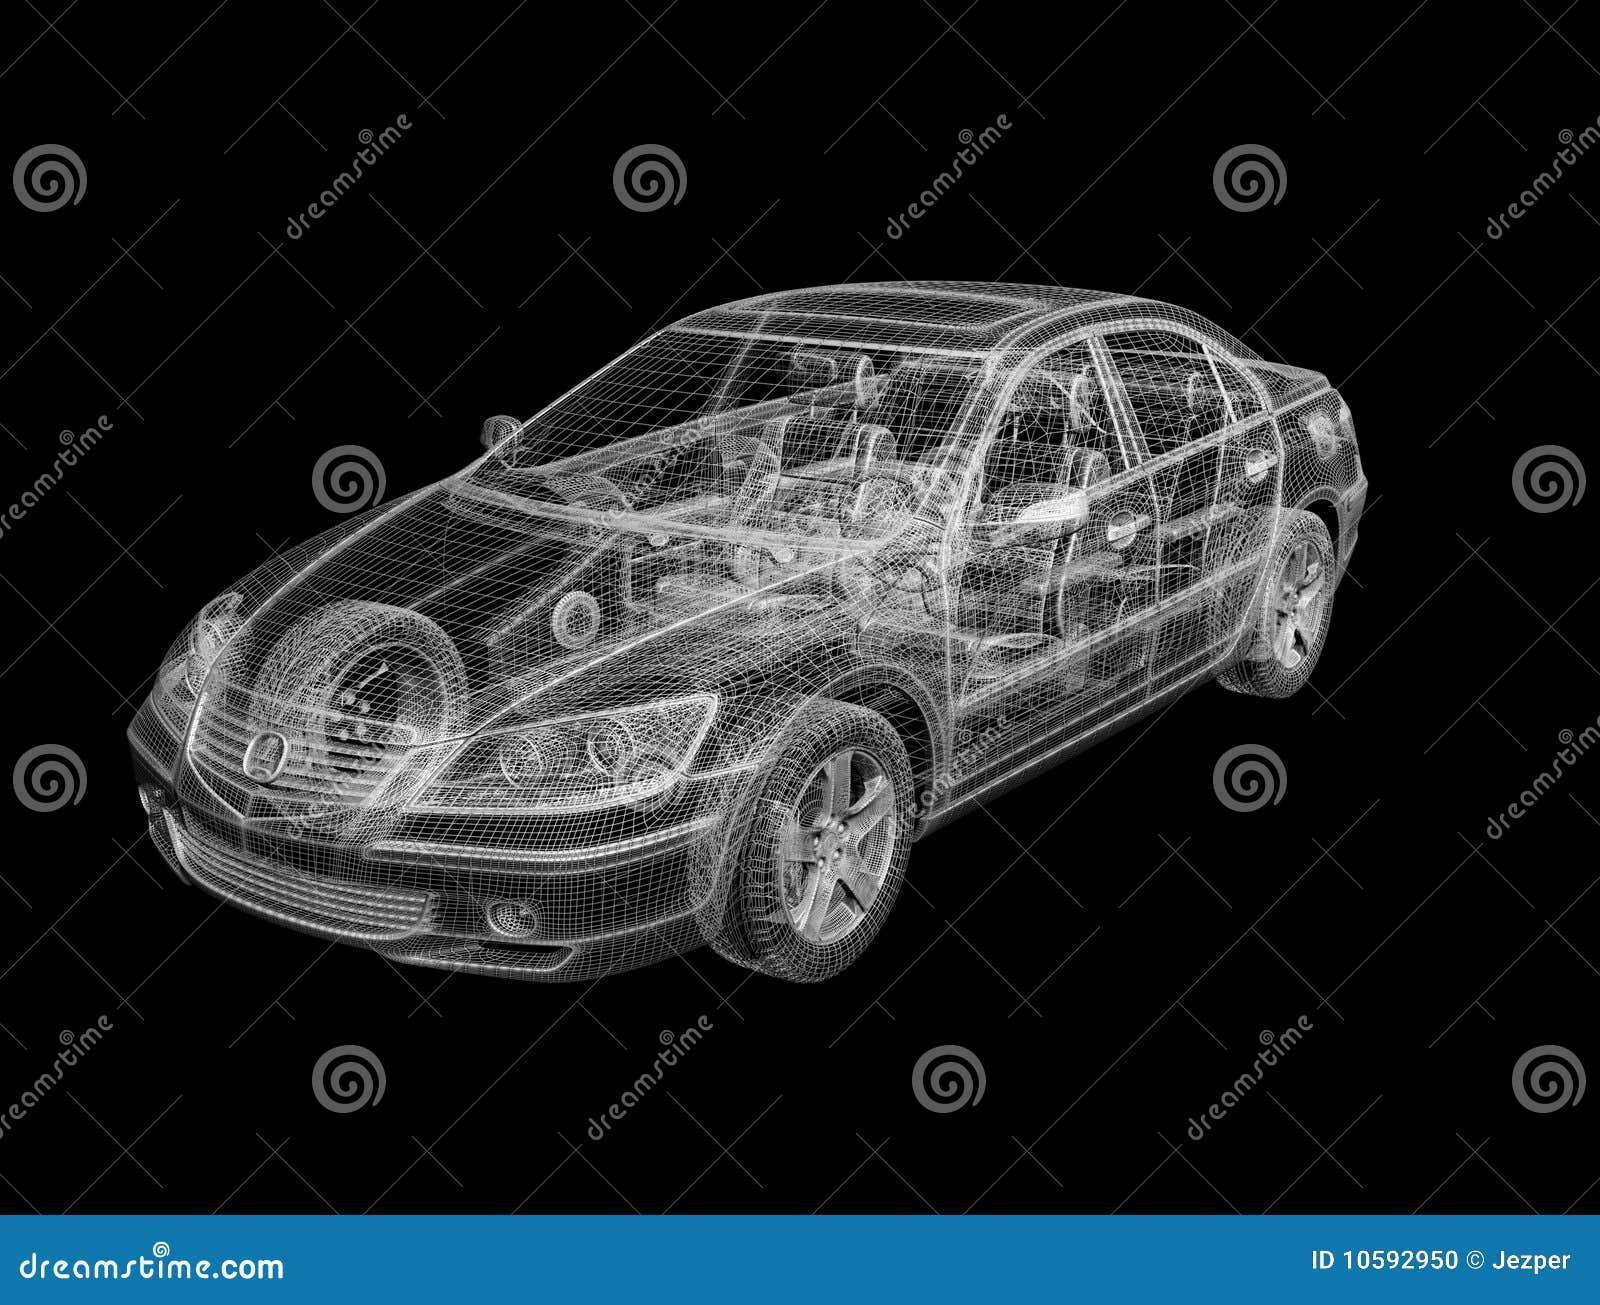 Sports car blueprints stock illustration. Illustration of blueprint ...